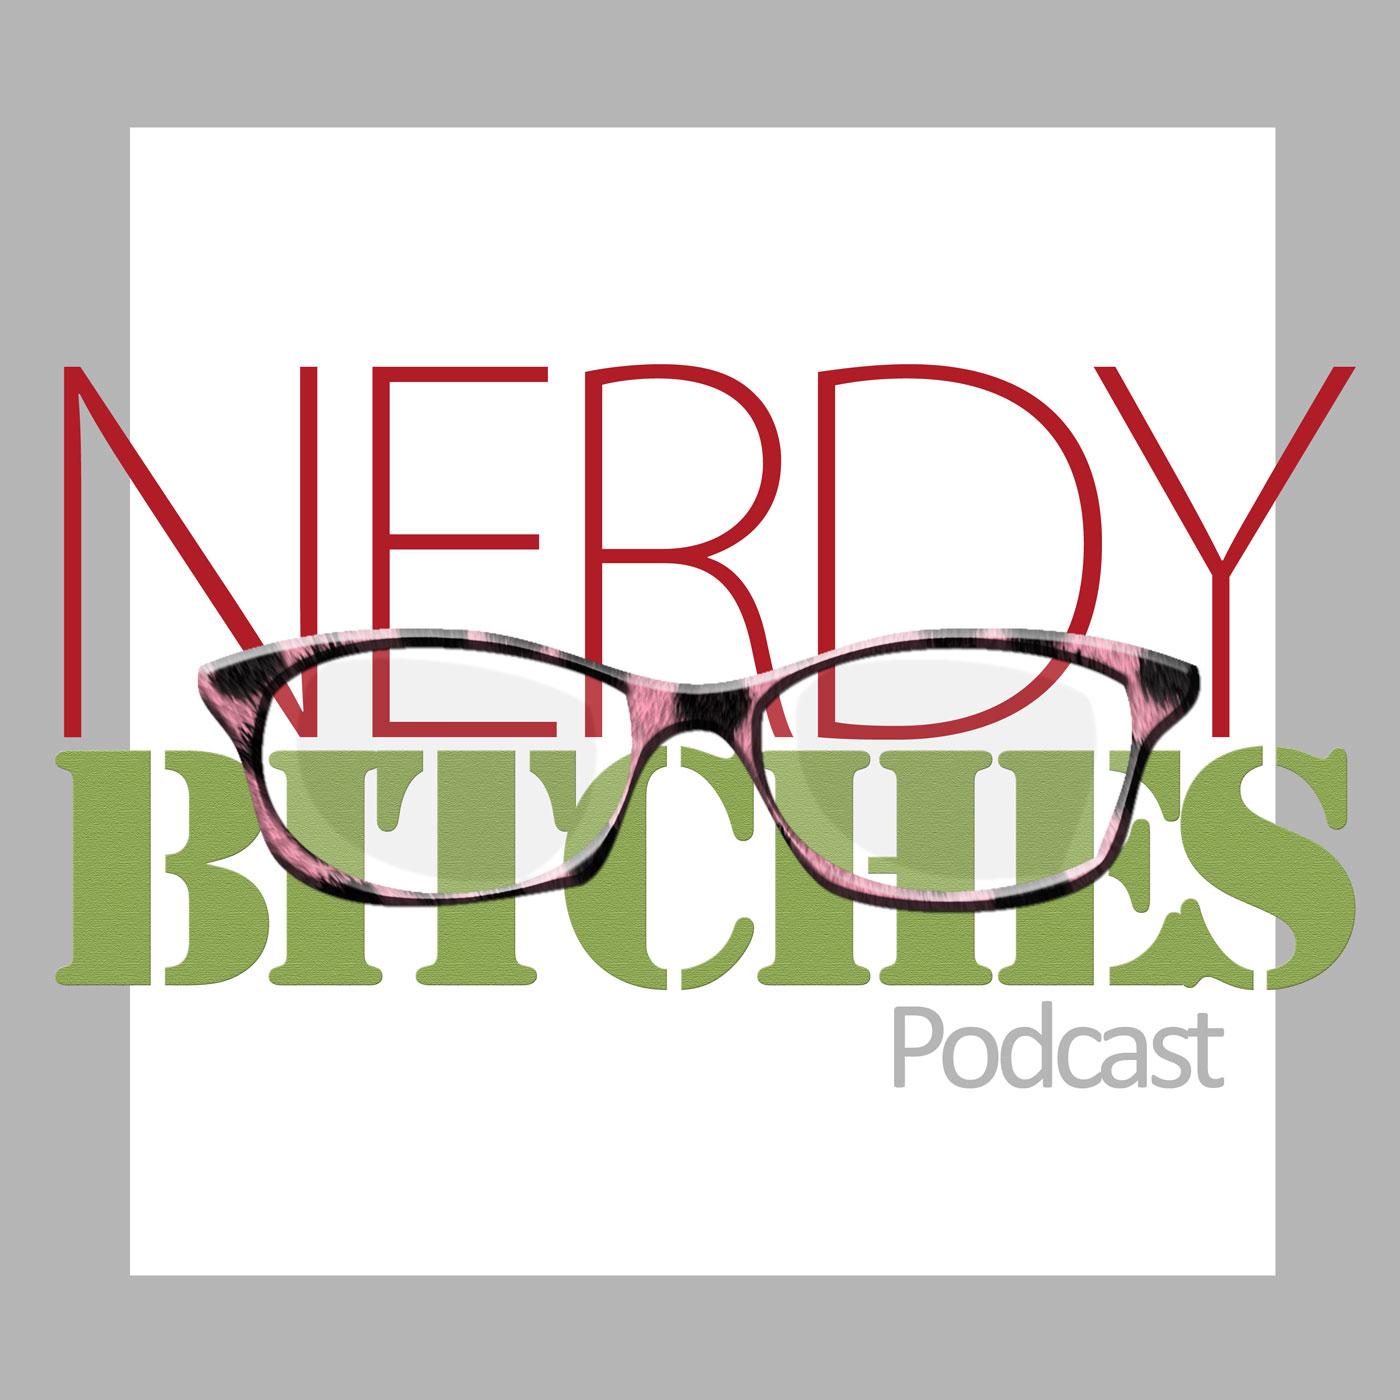 92757fa5c306 Podcast Episodes - Nerdy Bitches Podcast